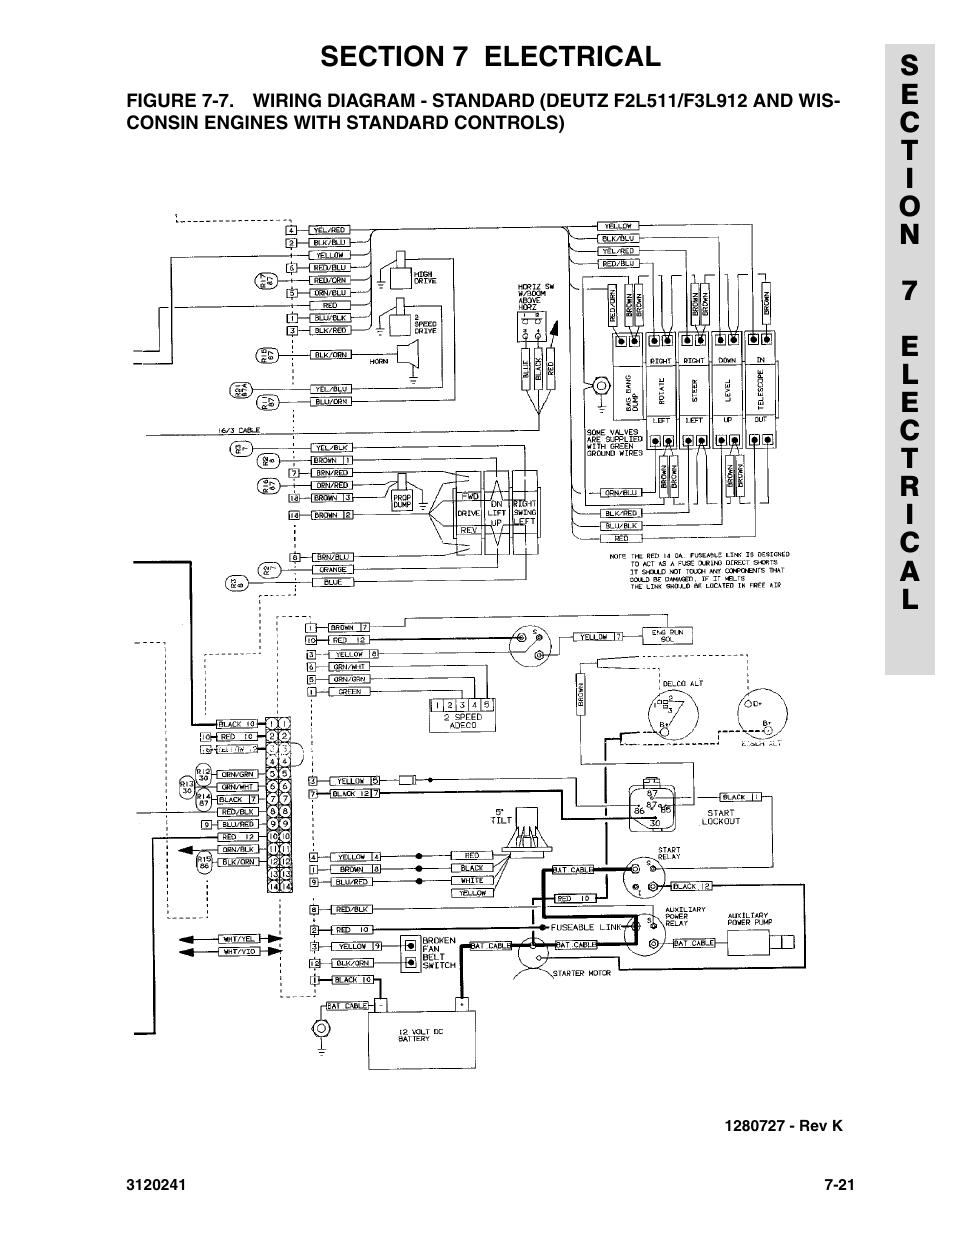 jlg 40h wiring diagram - merco wiring diagram for wiring diagram schematics  wiring diagram and schematics